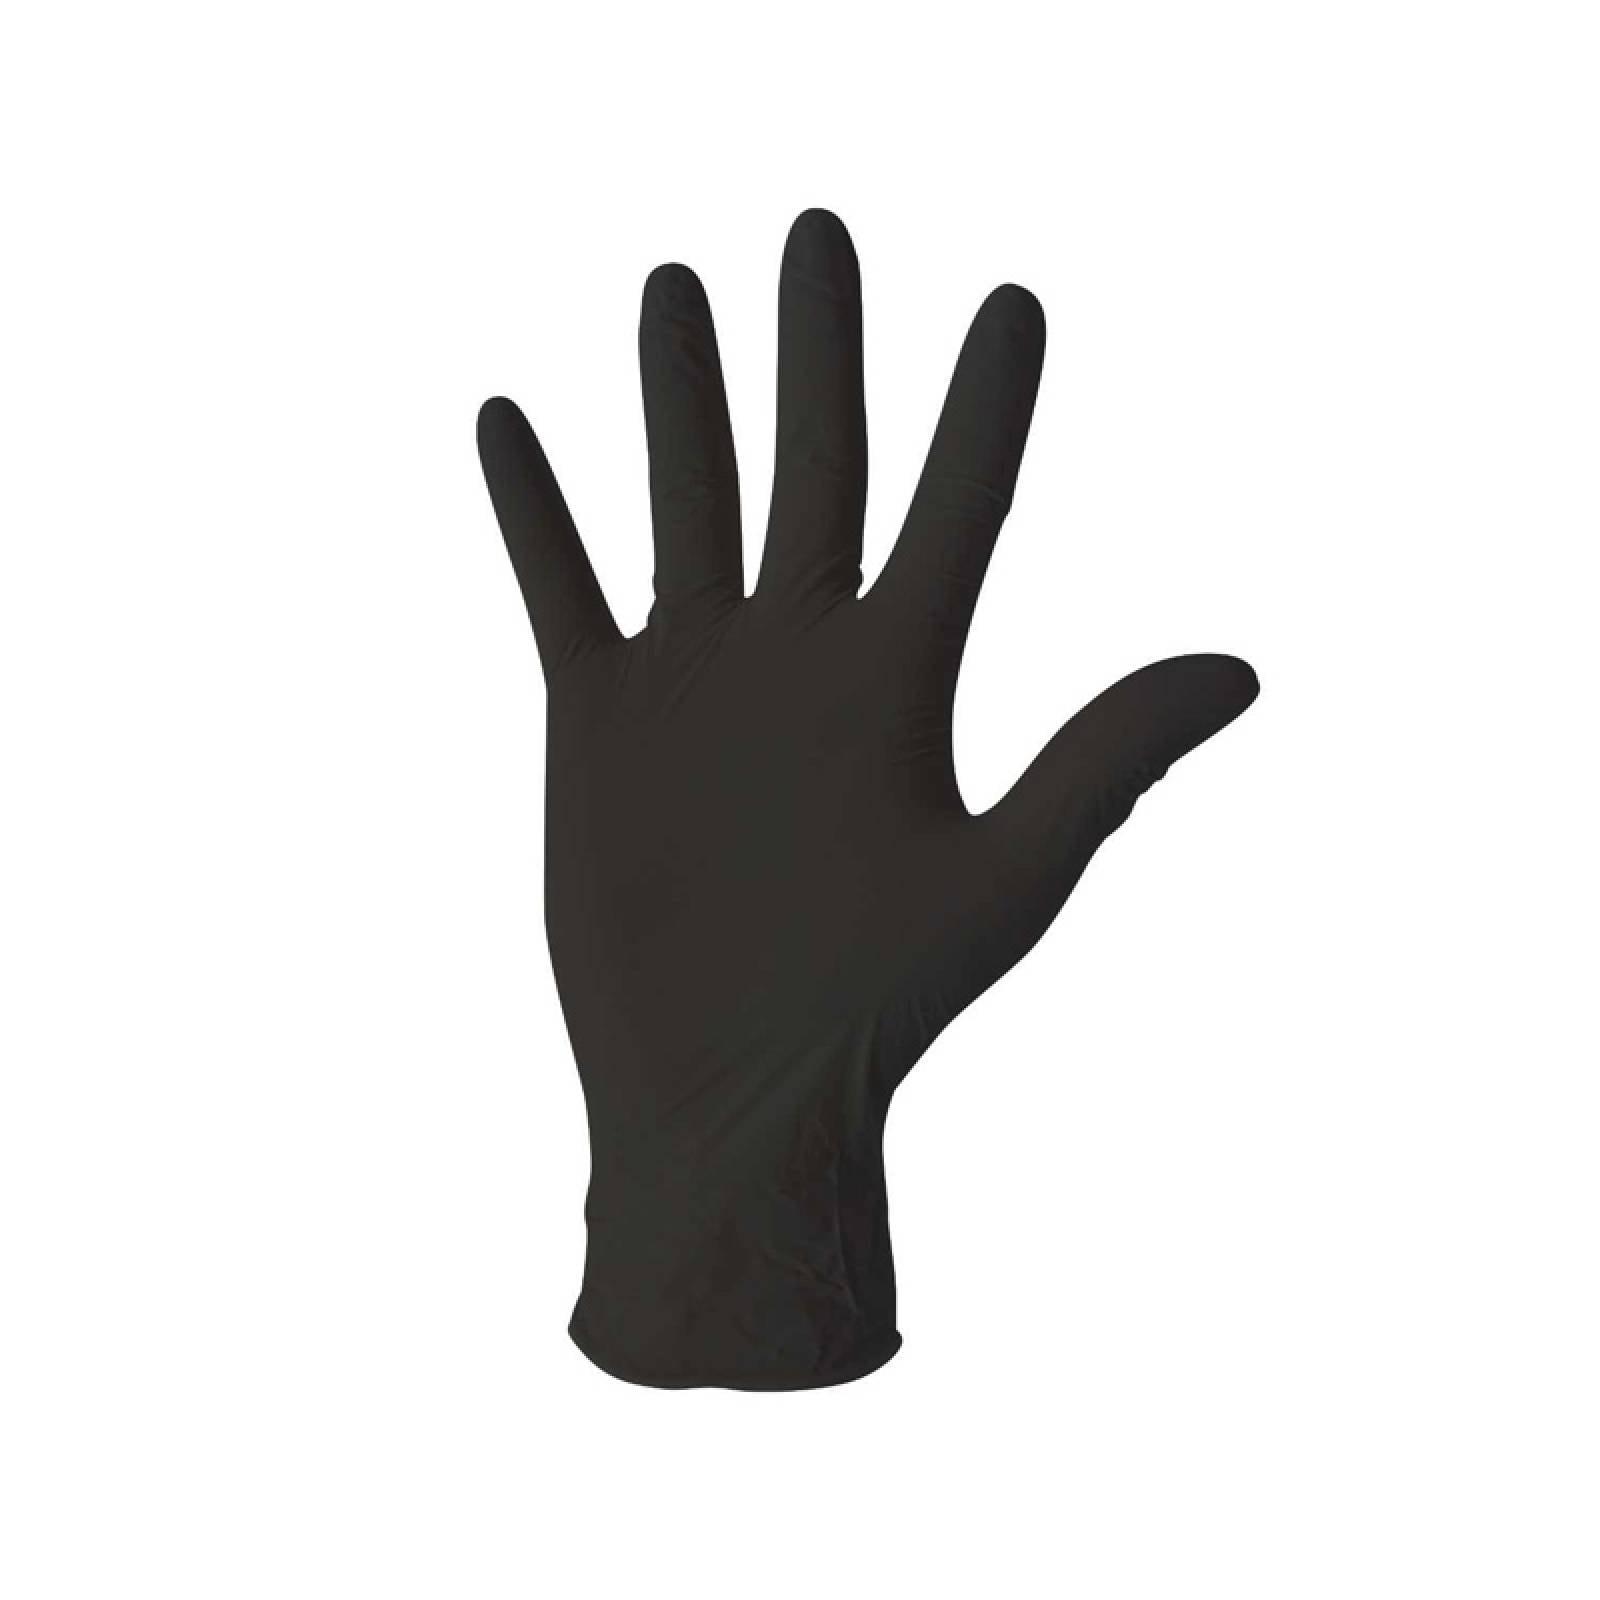 Guante Profesional Mediano Latex Negro Caja 20 Piezas Lobo